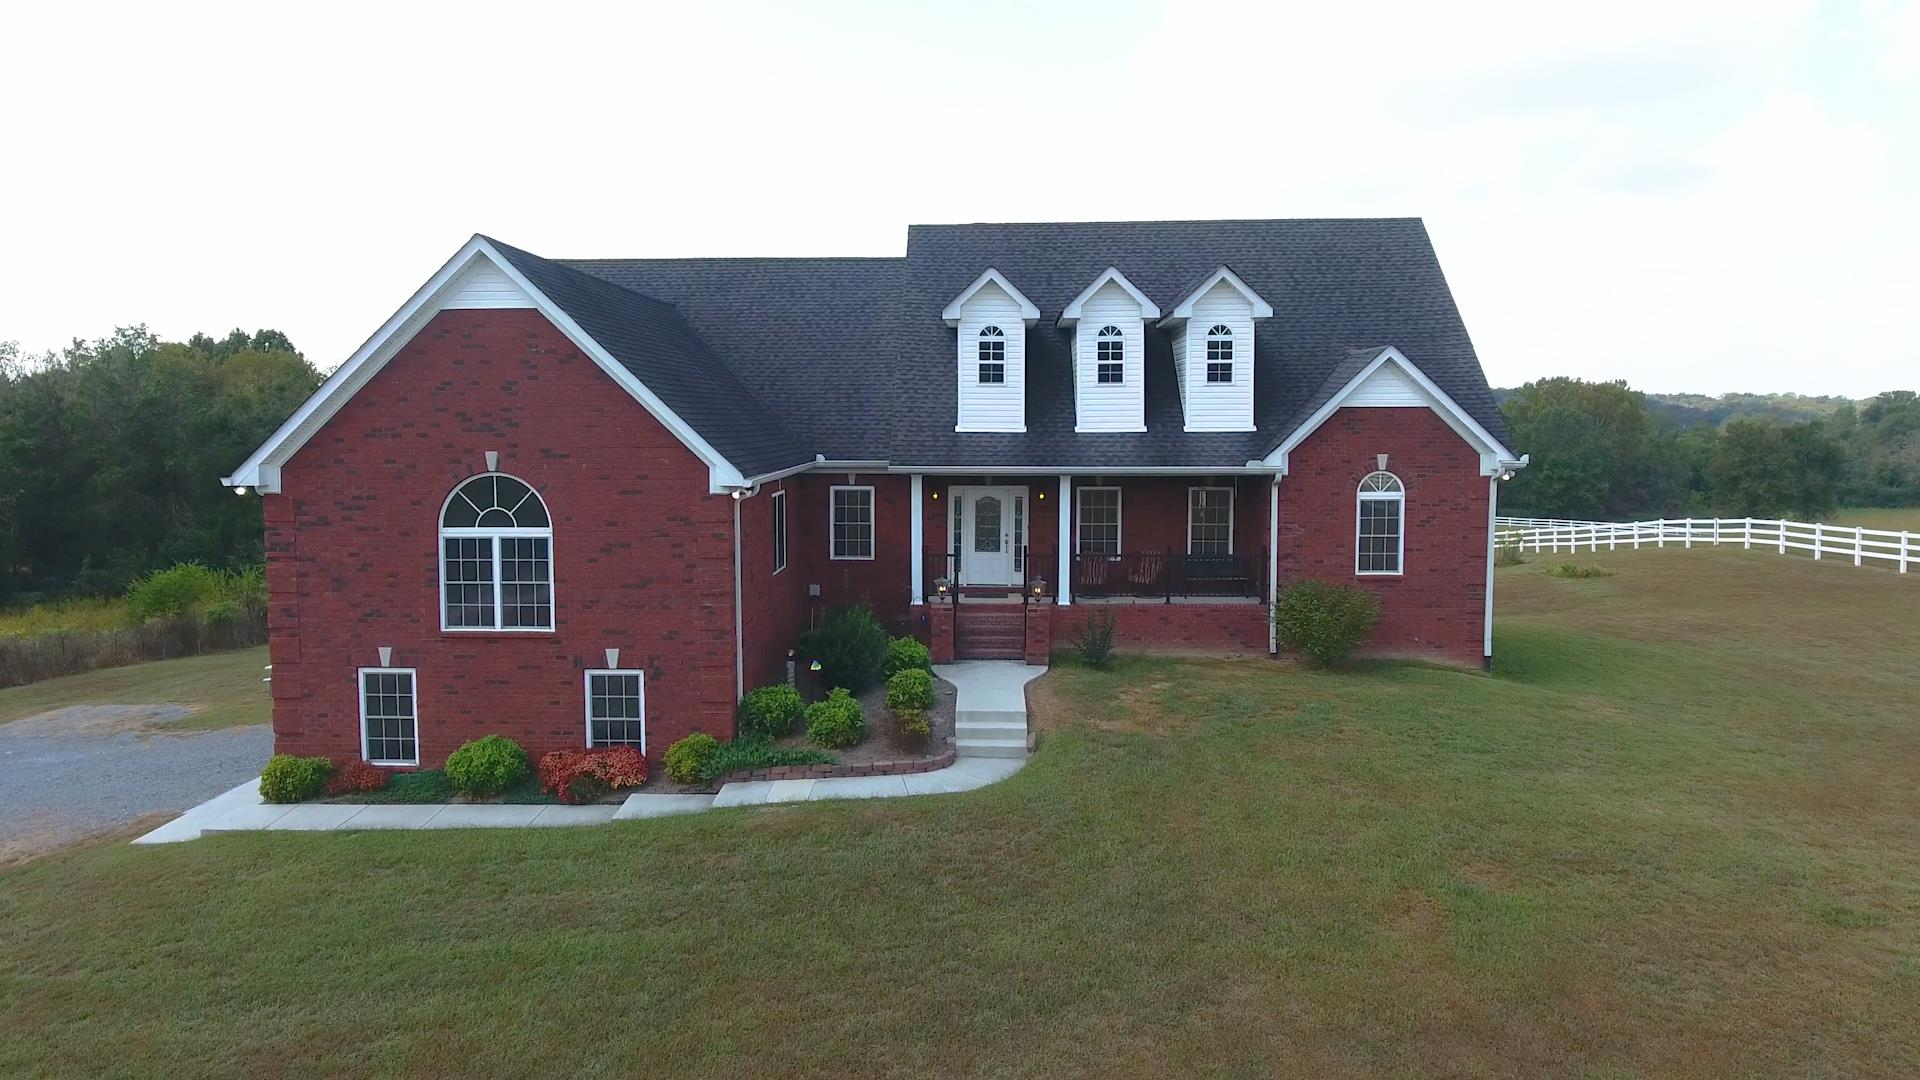 109 Cherokee Dr, Shelbyville, TN 37160 - Shelbyville, TN real estate listing